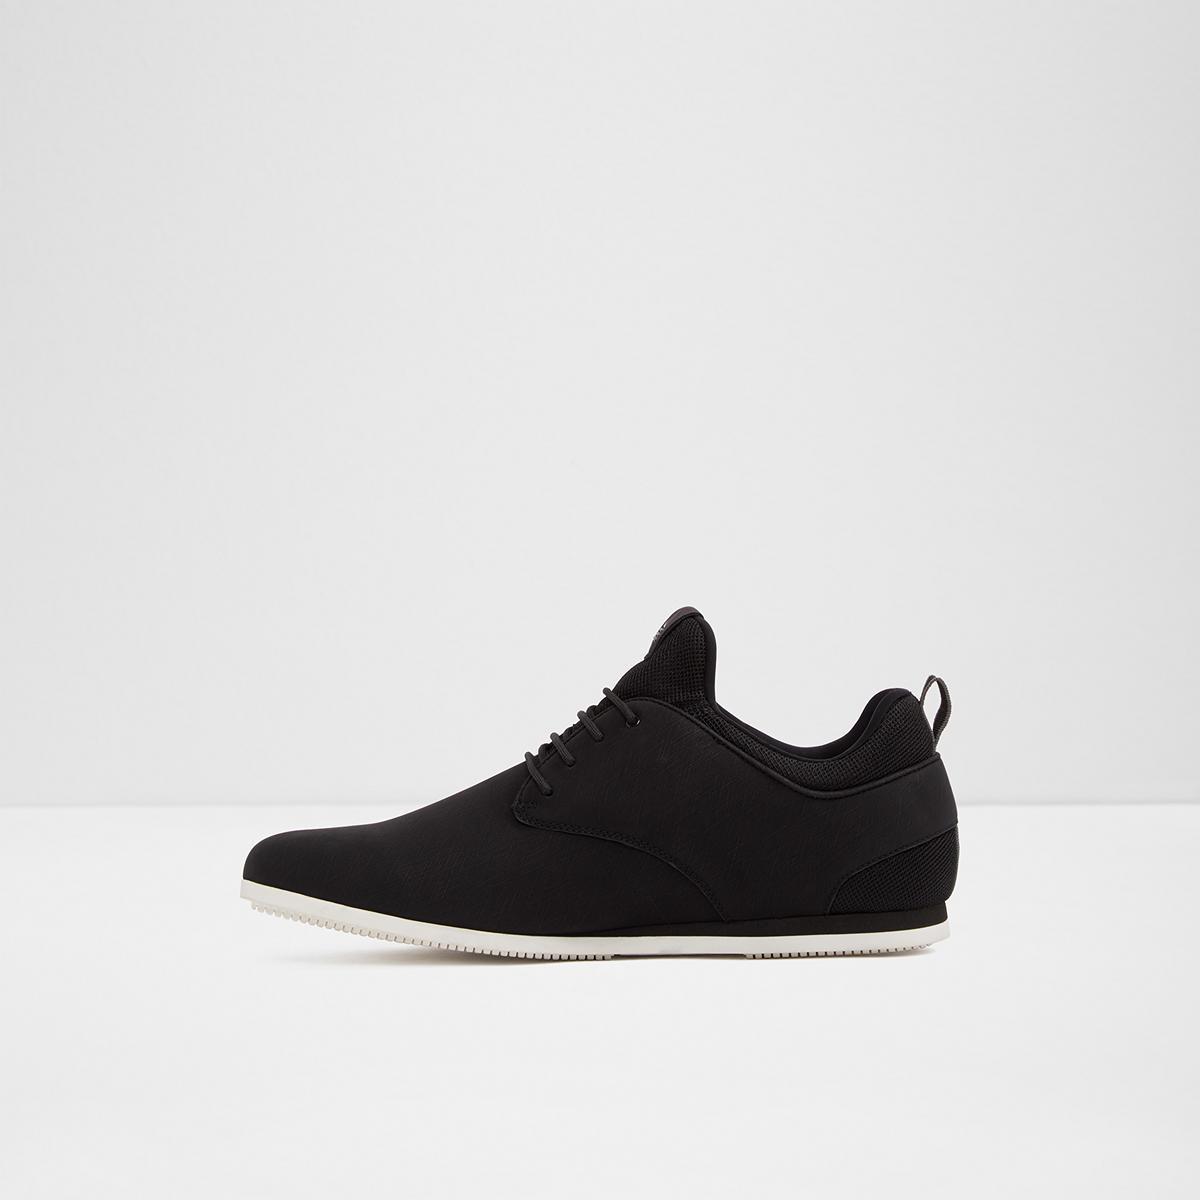 80514b1ba56760 Preilia Black Men s Sneakers